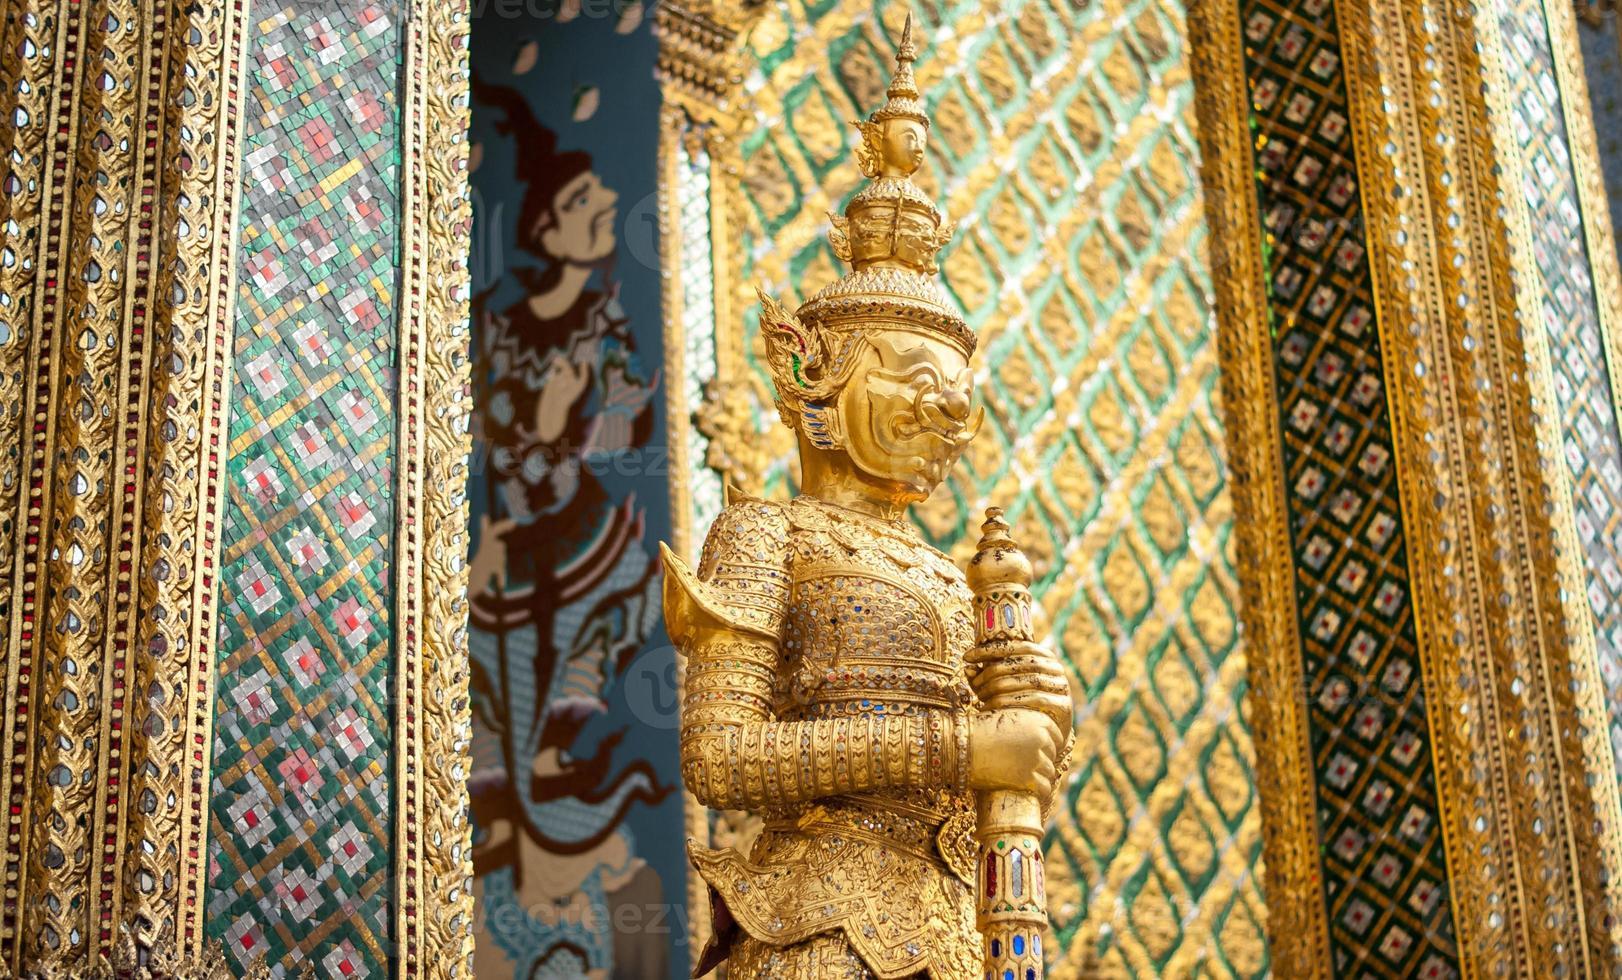 thai Sculpture photo